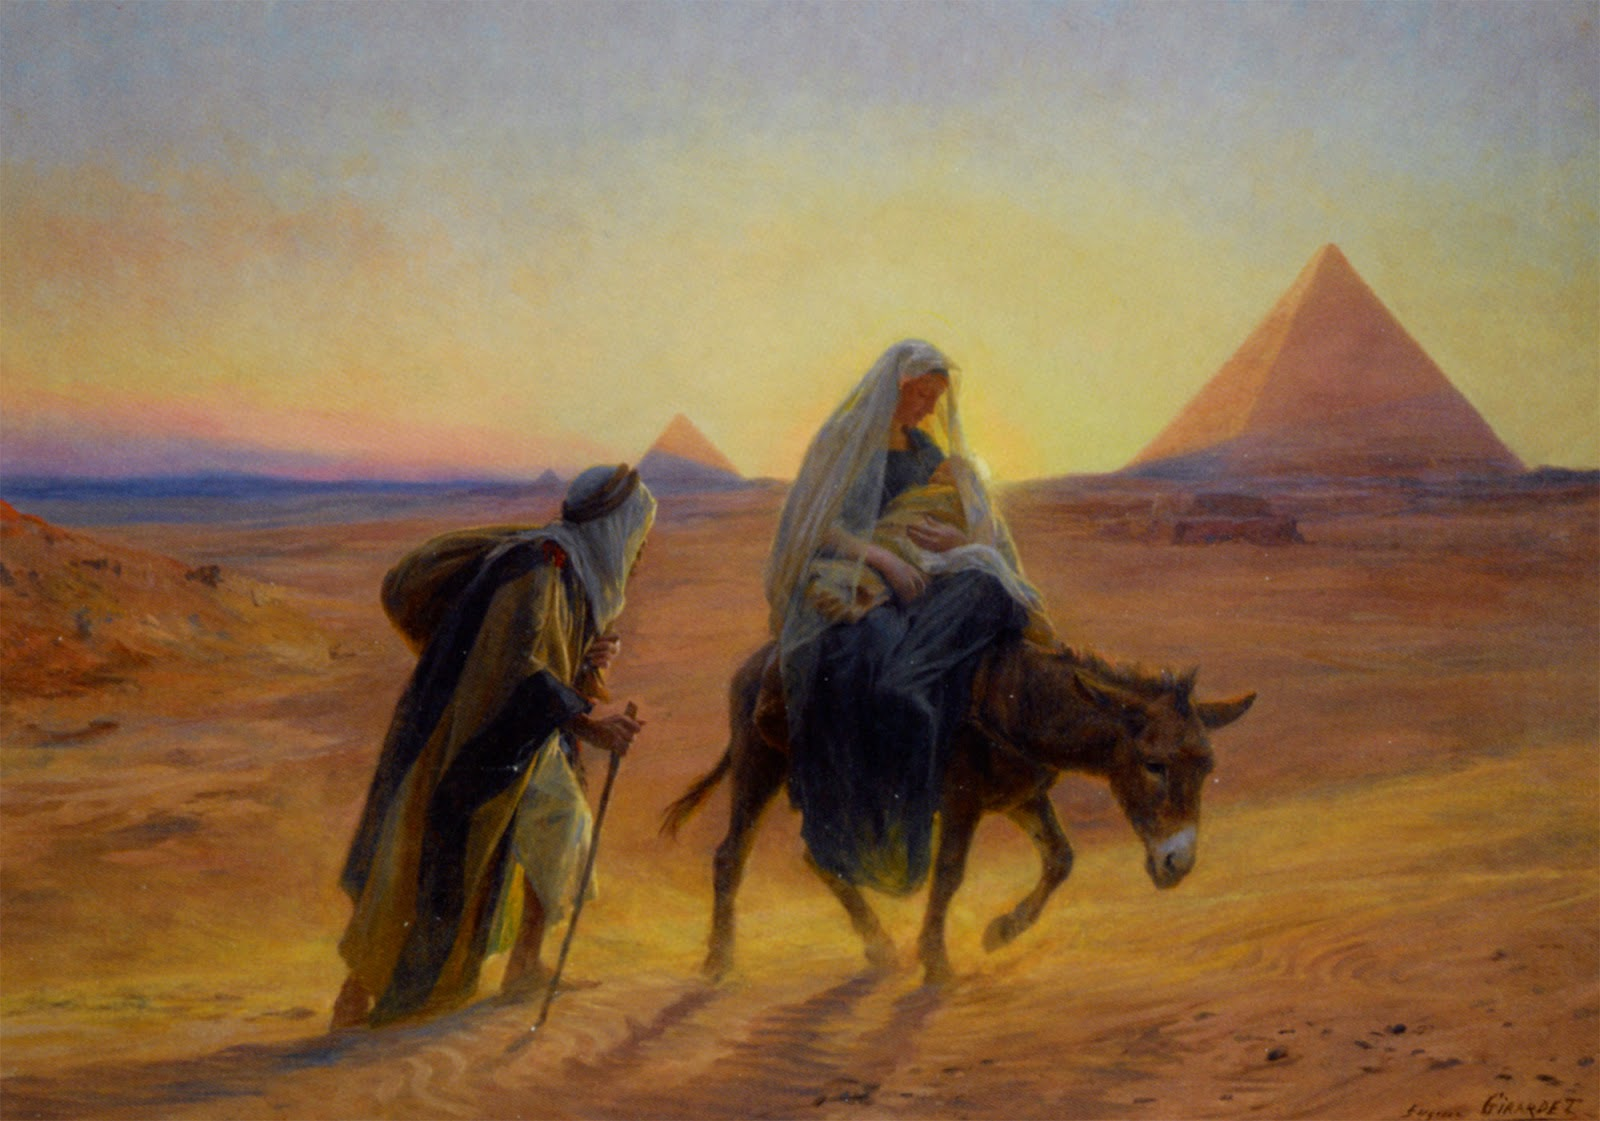 bible 7 treasures is jesus the savior of the world